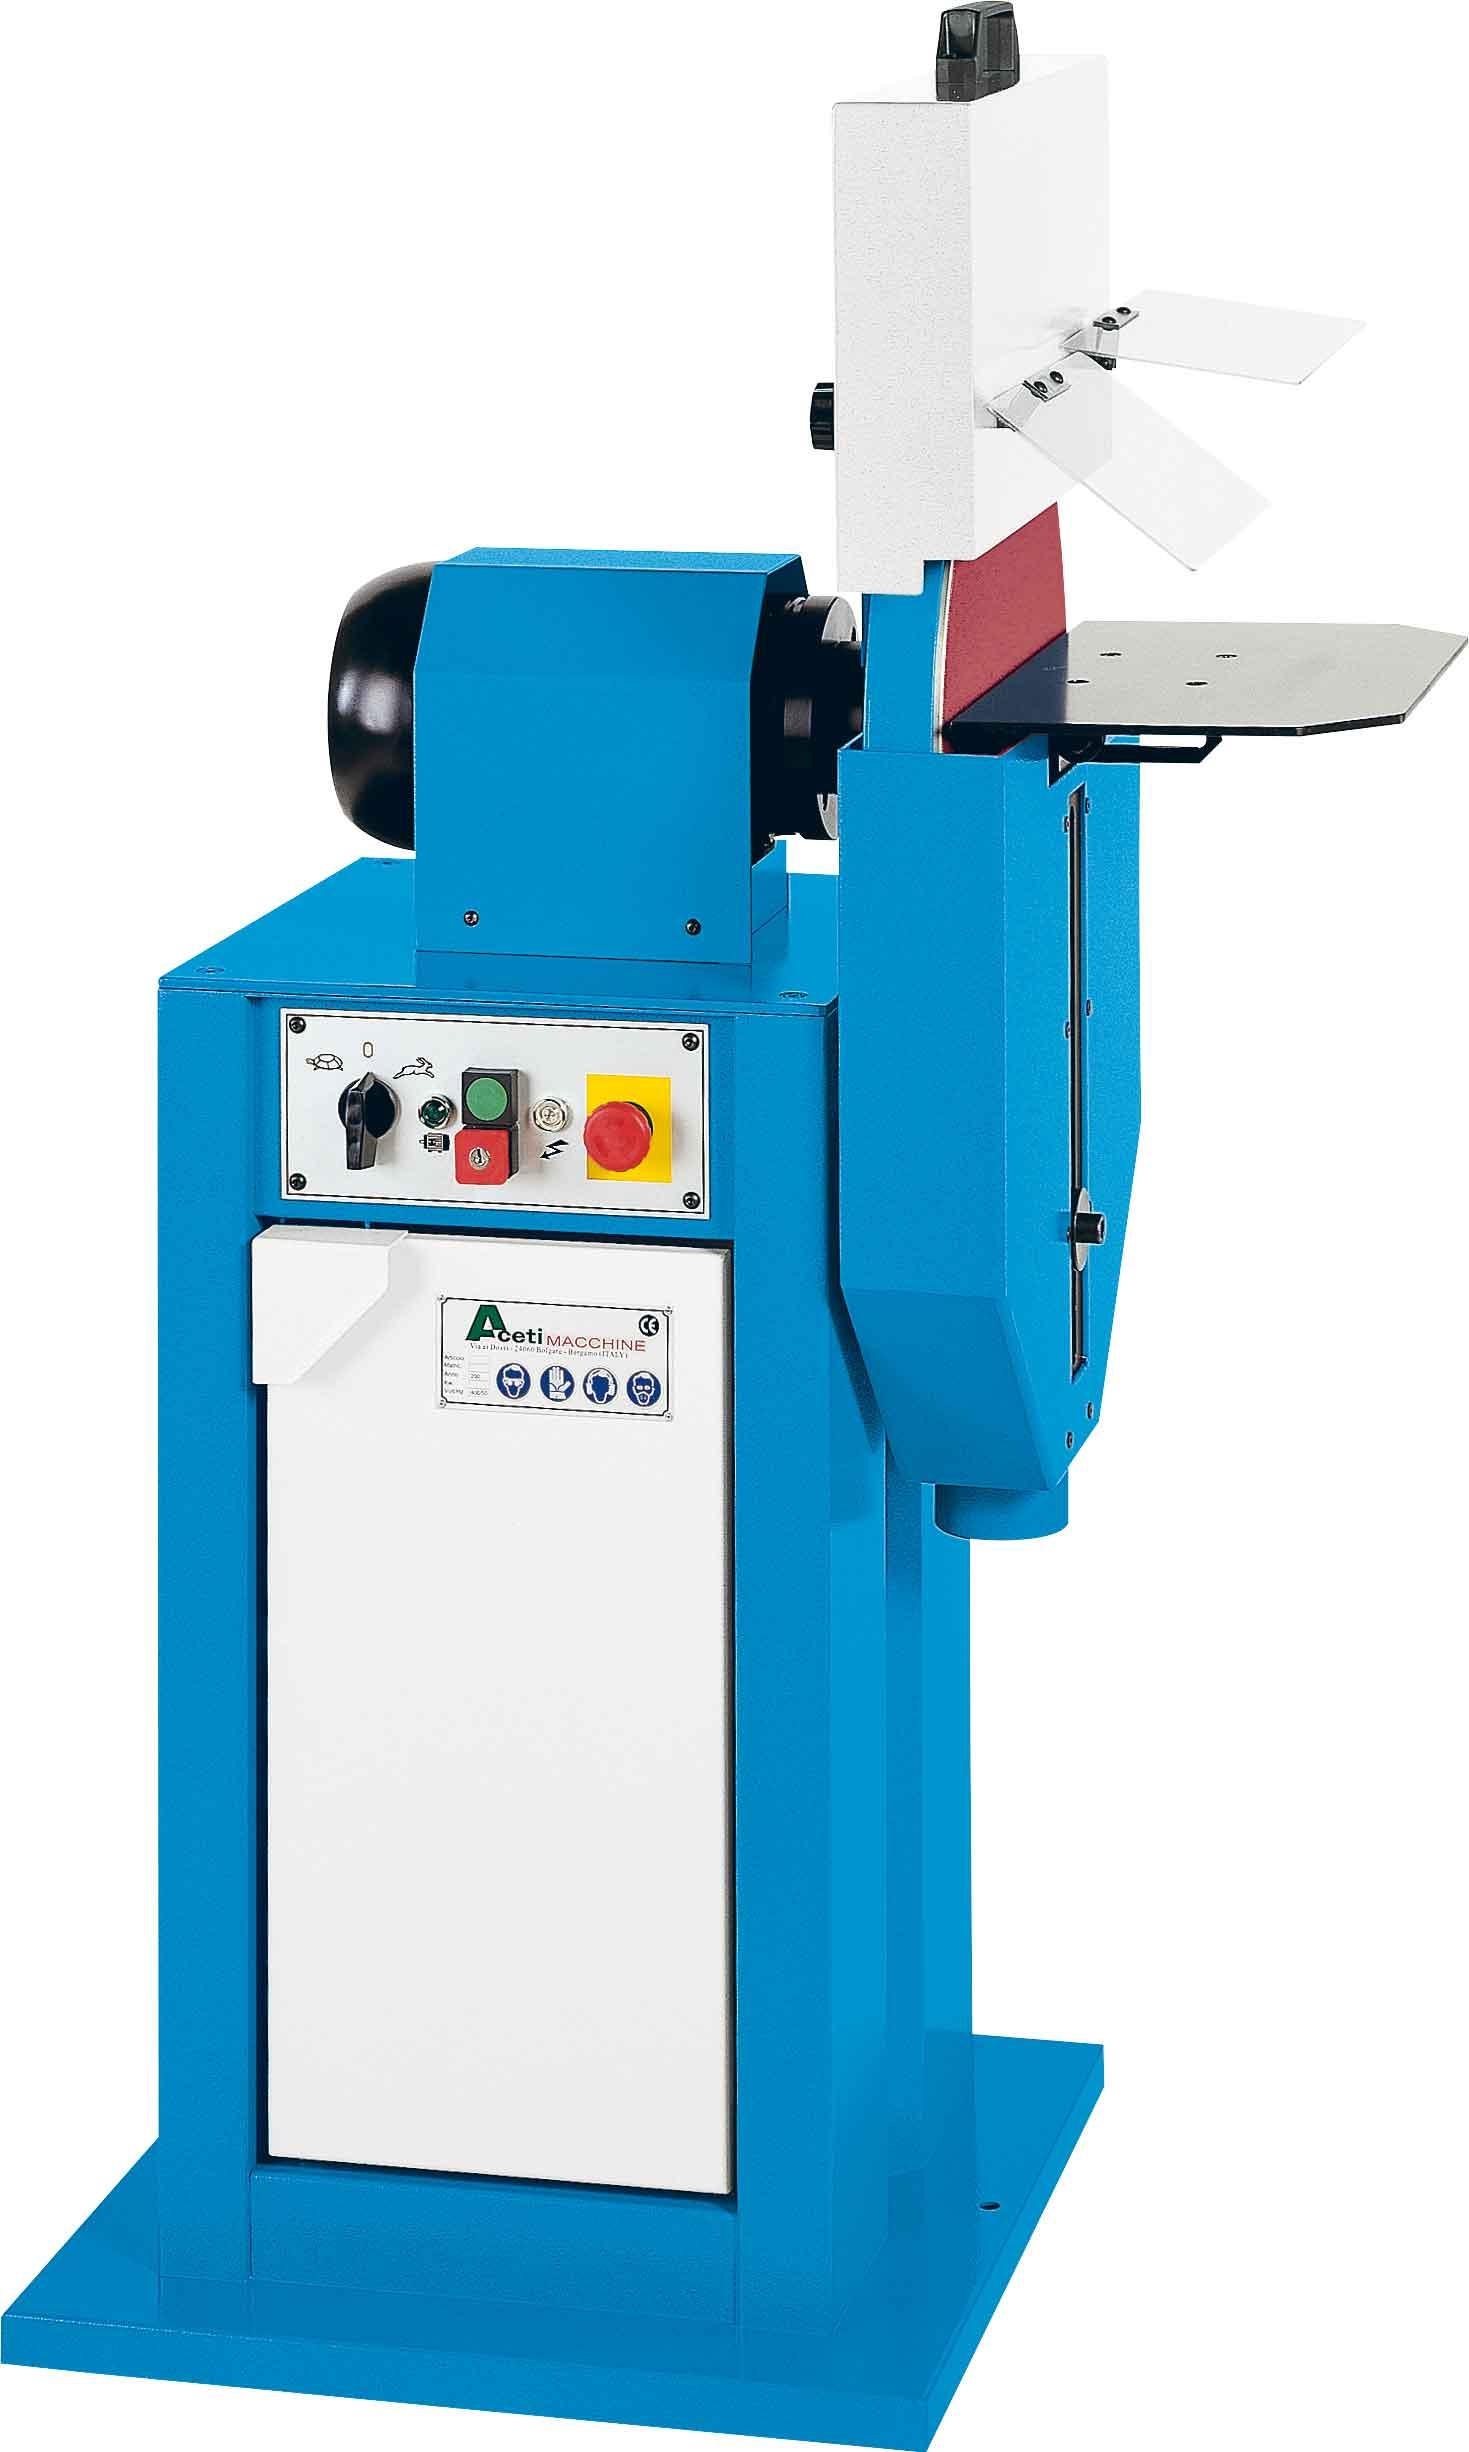 ART.24 - Disc grinding machine